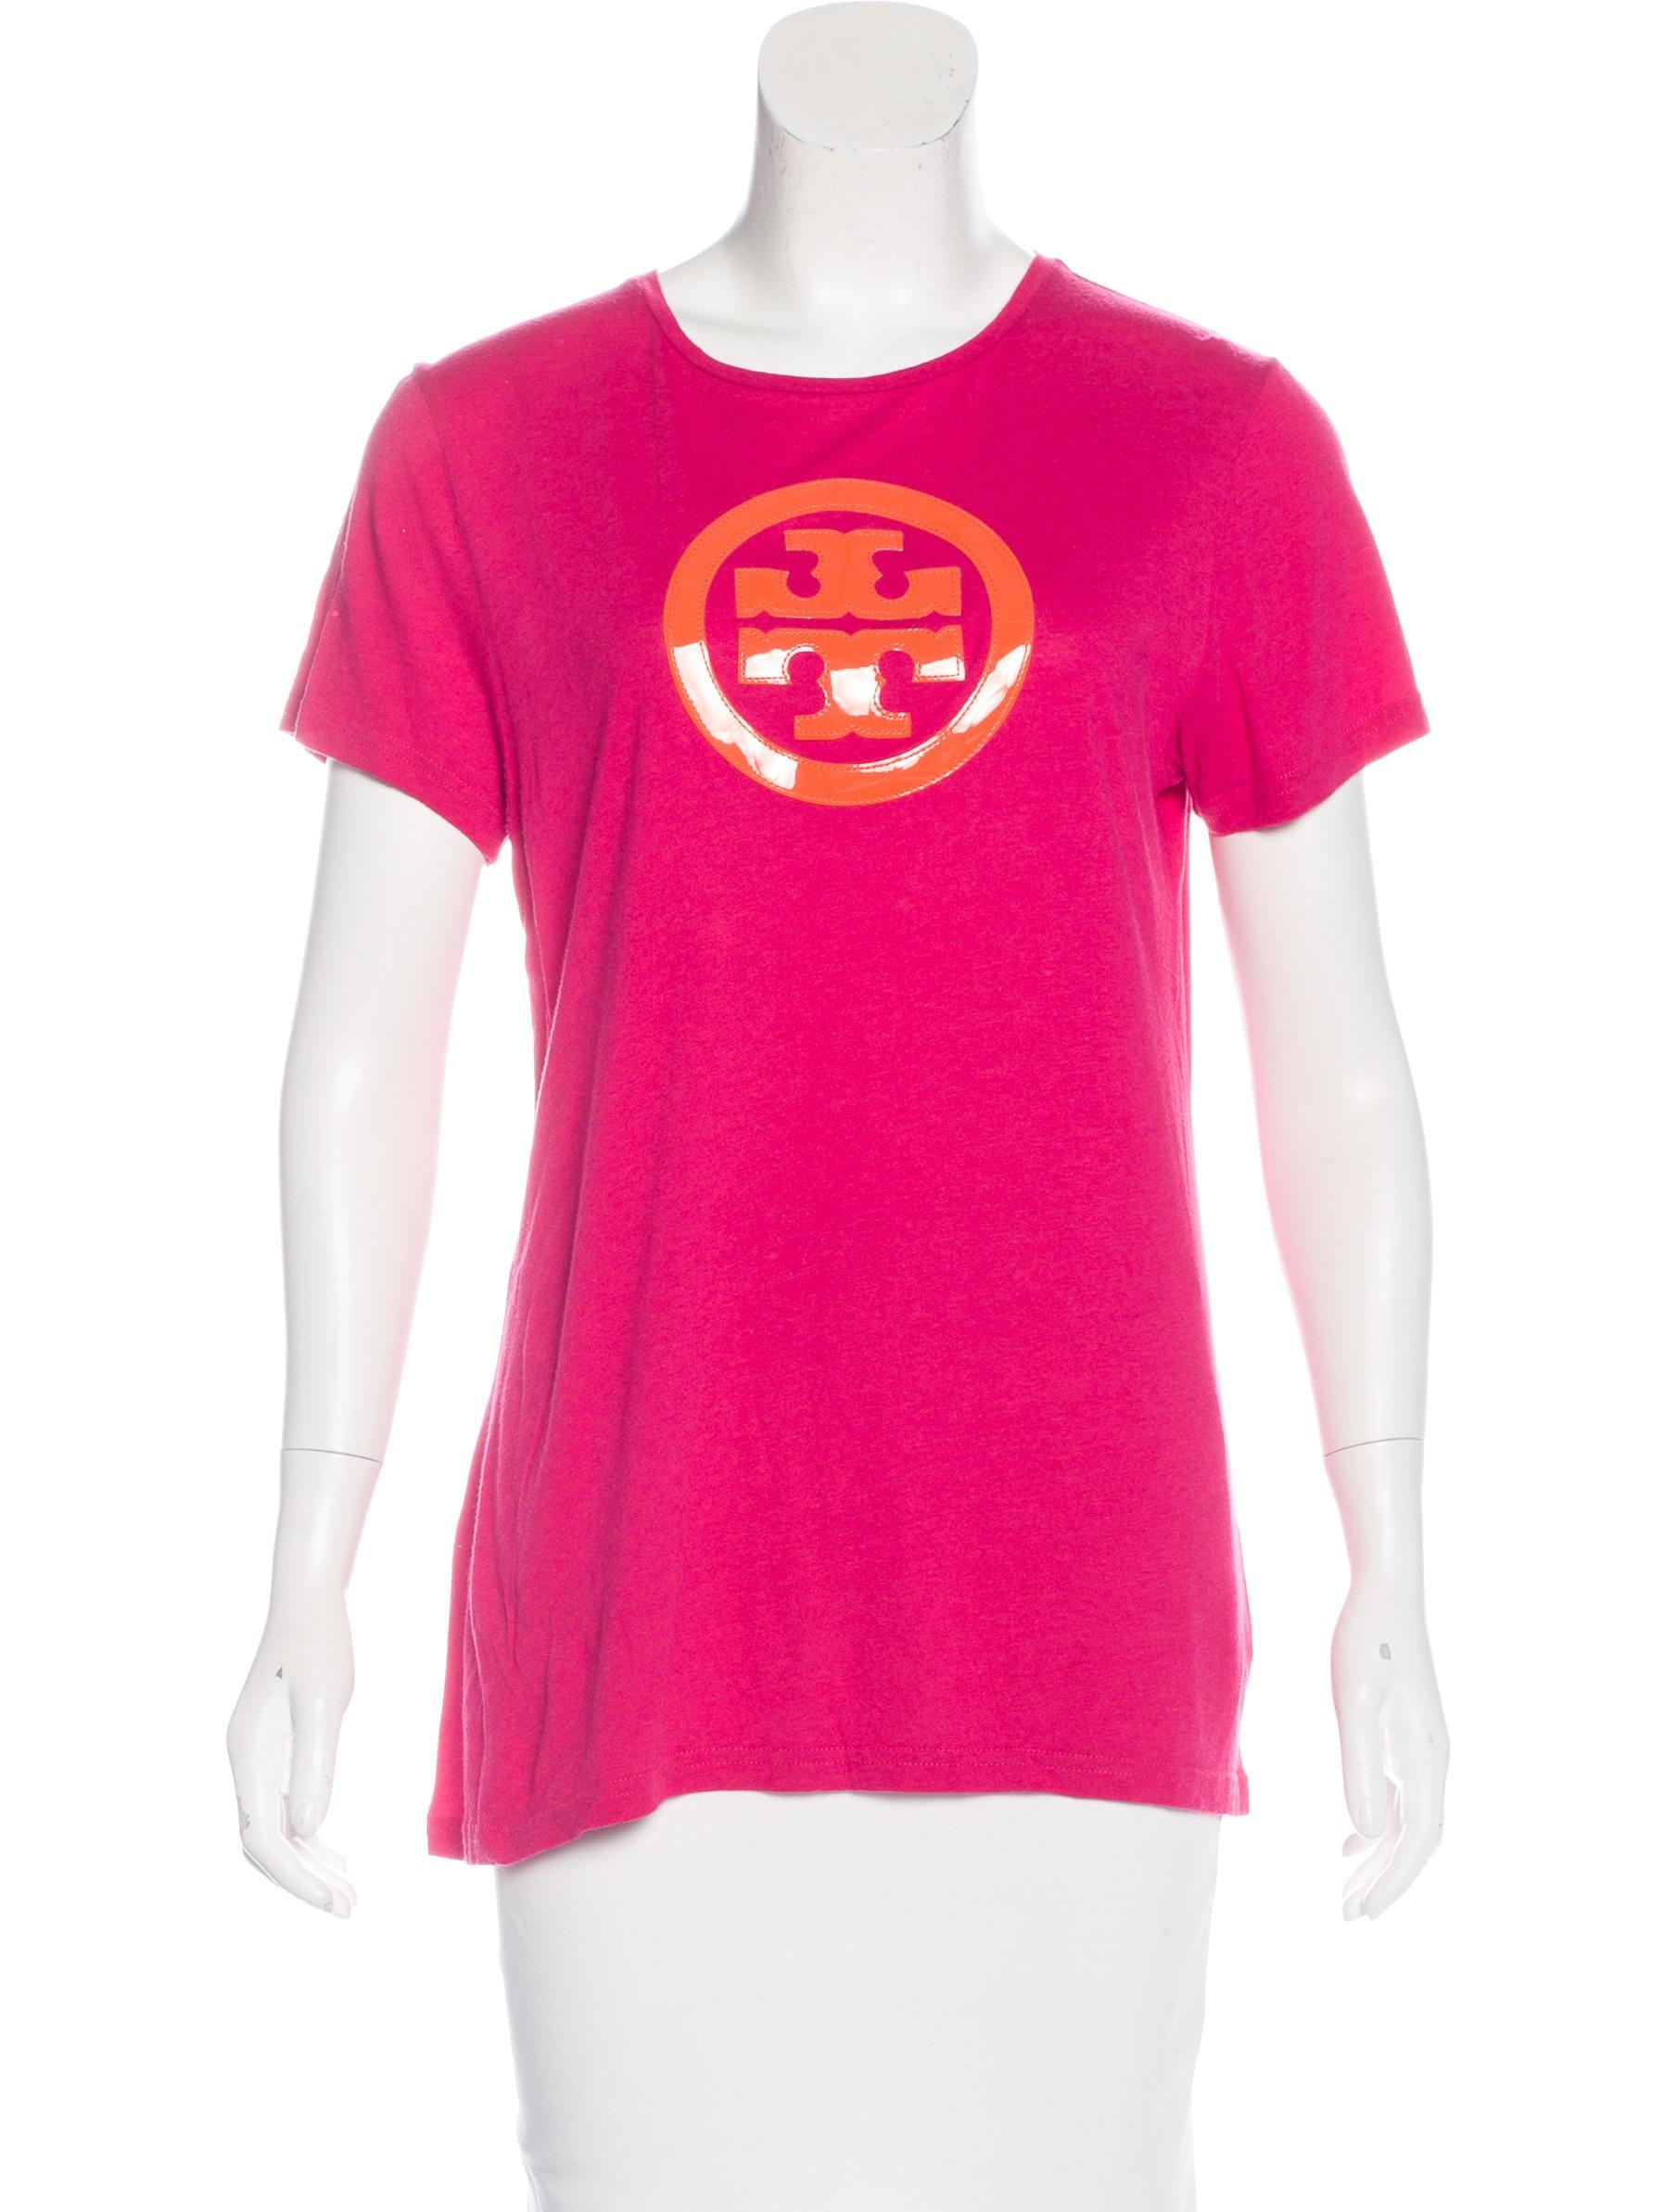 Tory burch logo embellished t shirt clothing wto102647 for Tory burch t shirt